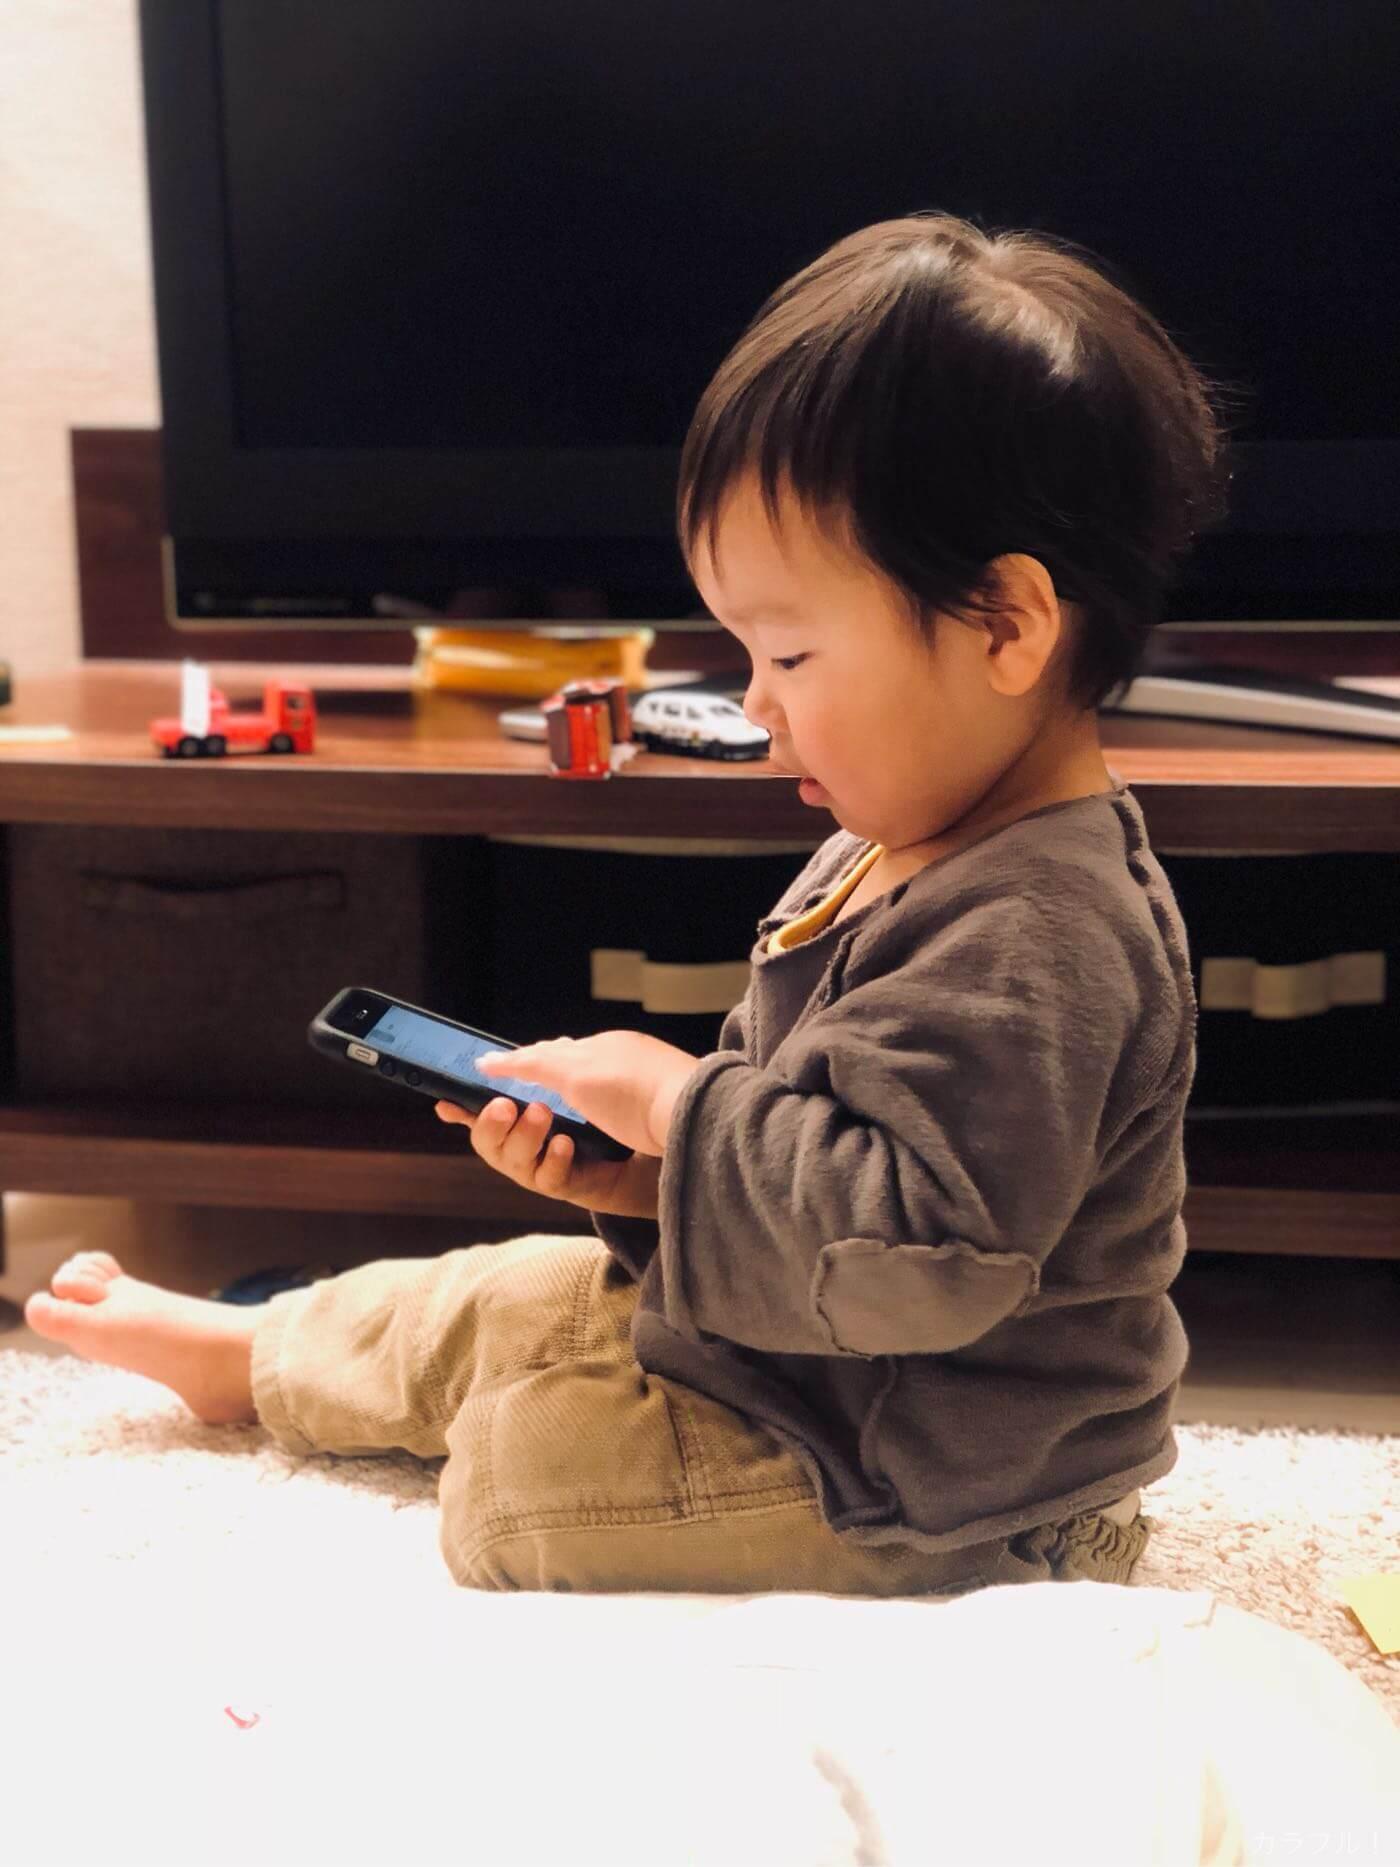 iPhoneを使いこなす兄